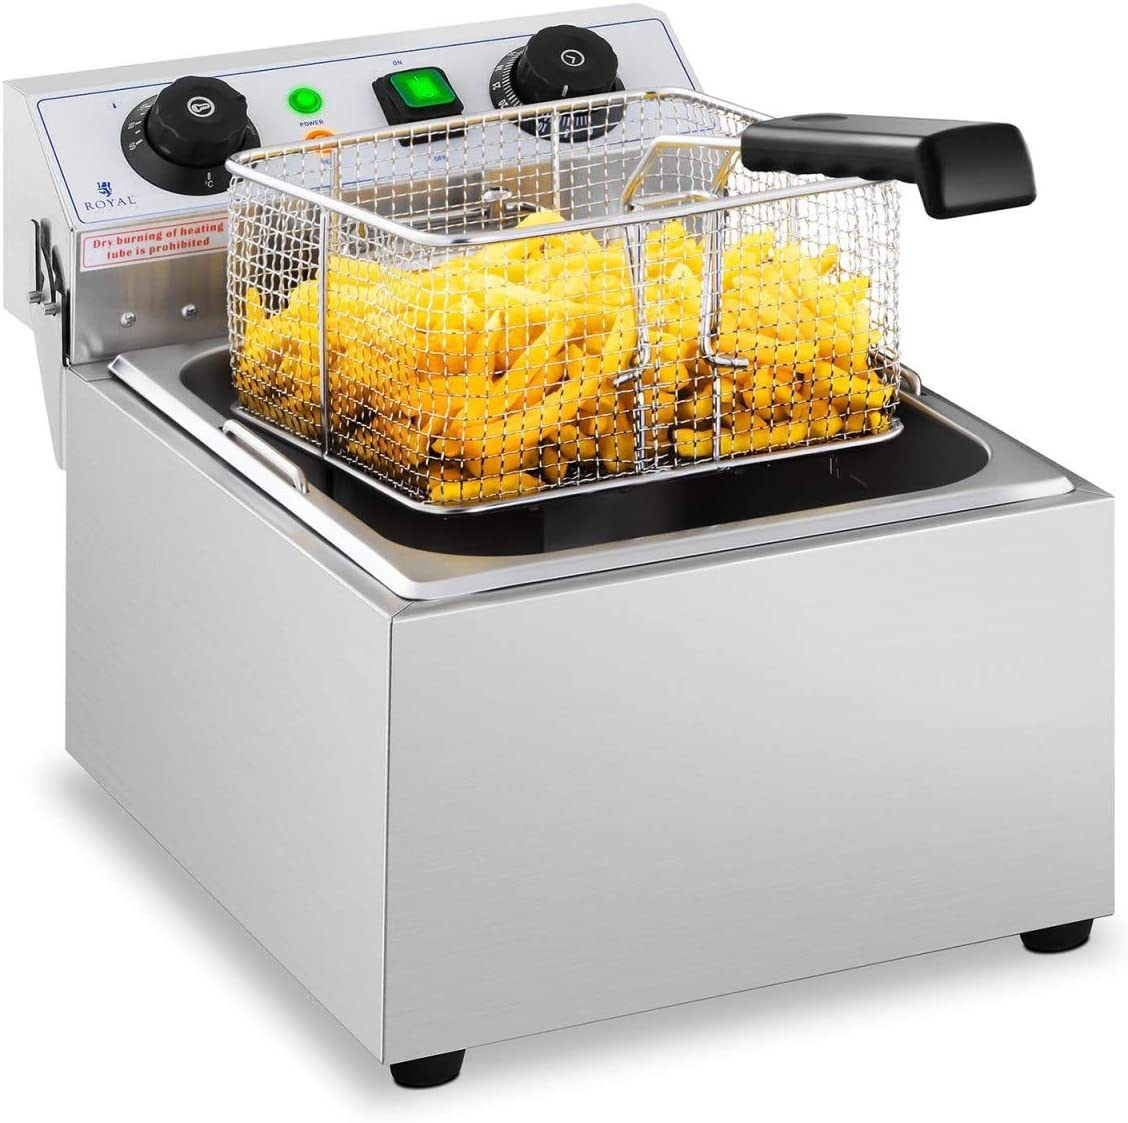 Royal Catering Freidora Eléctrica Para Hostelería 10 Litros 230 V RCTF 10EB (3.200 Watt, Temporizador 60 Min, Temperatura: 50-200 °C)